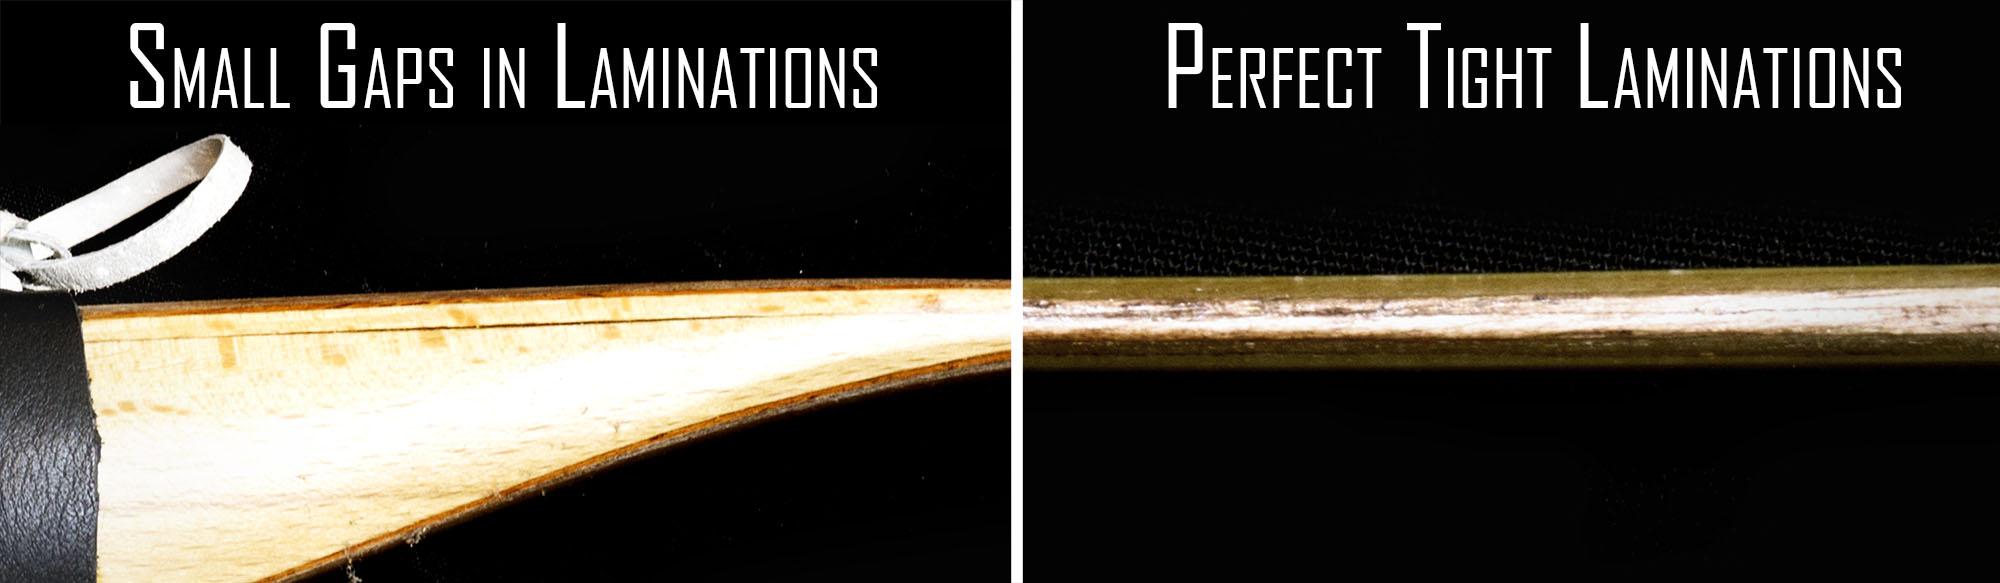 Lamination gaps